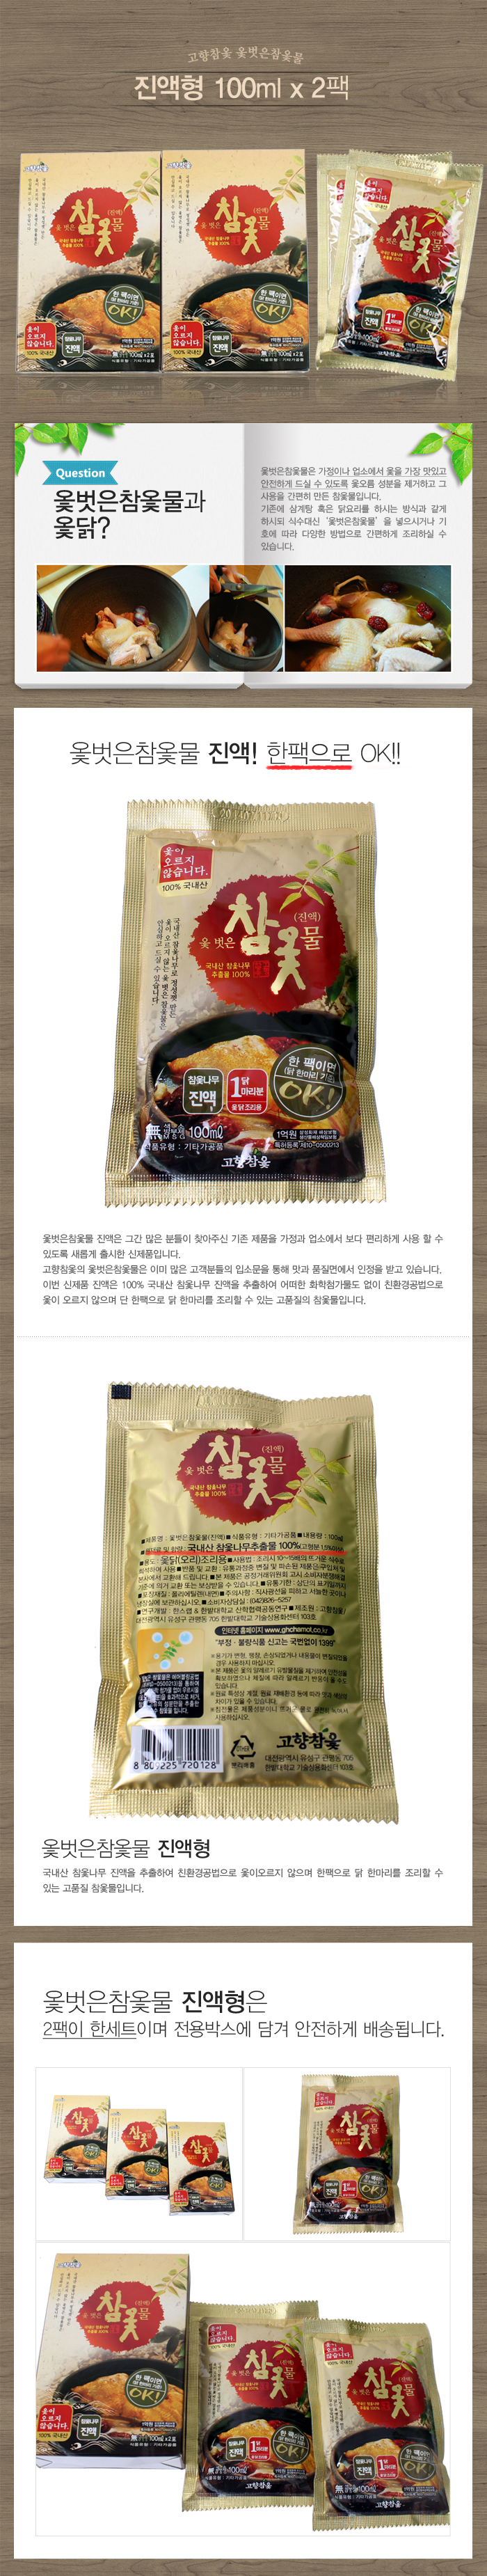 product01_03_01.jpg